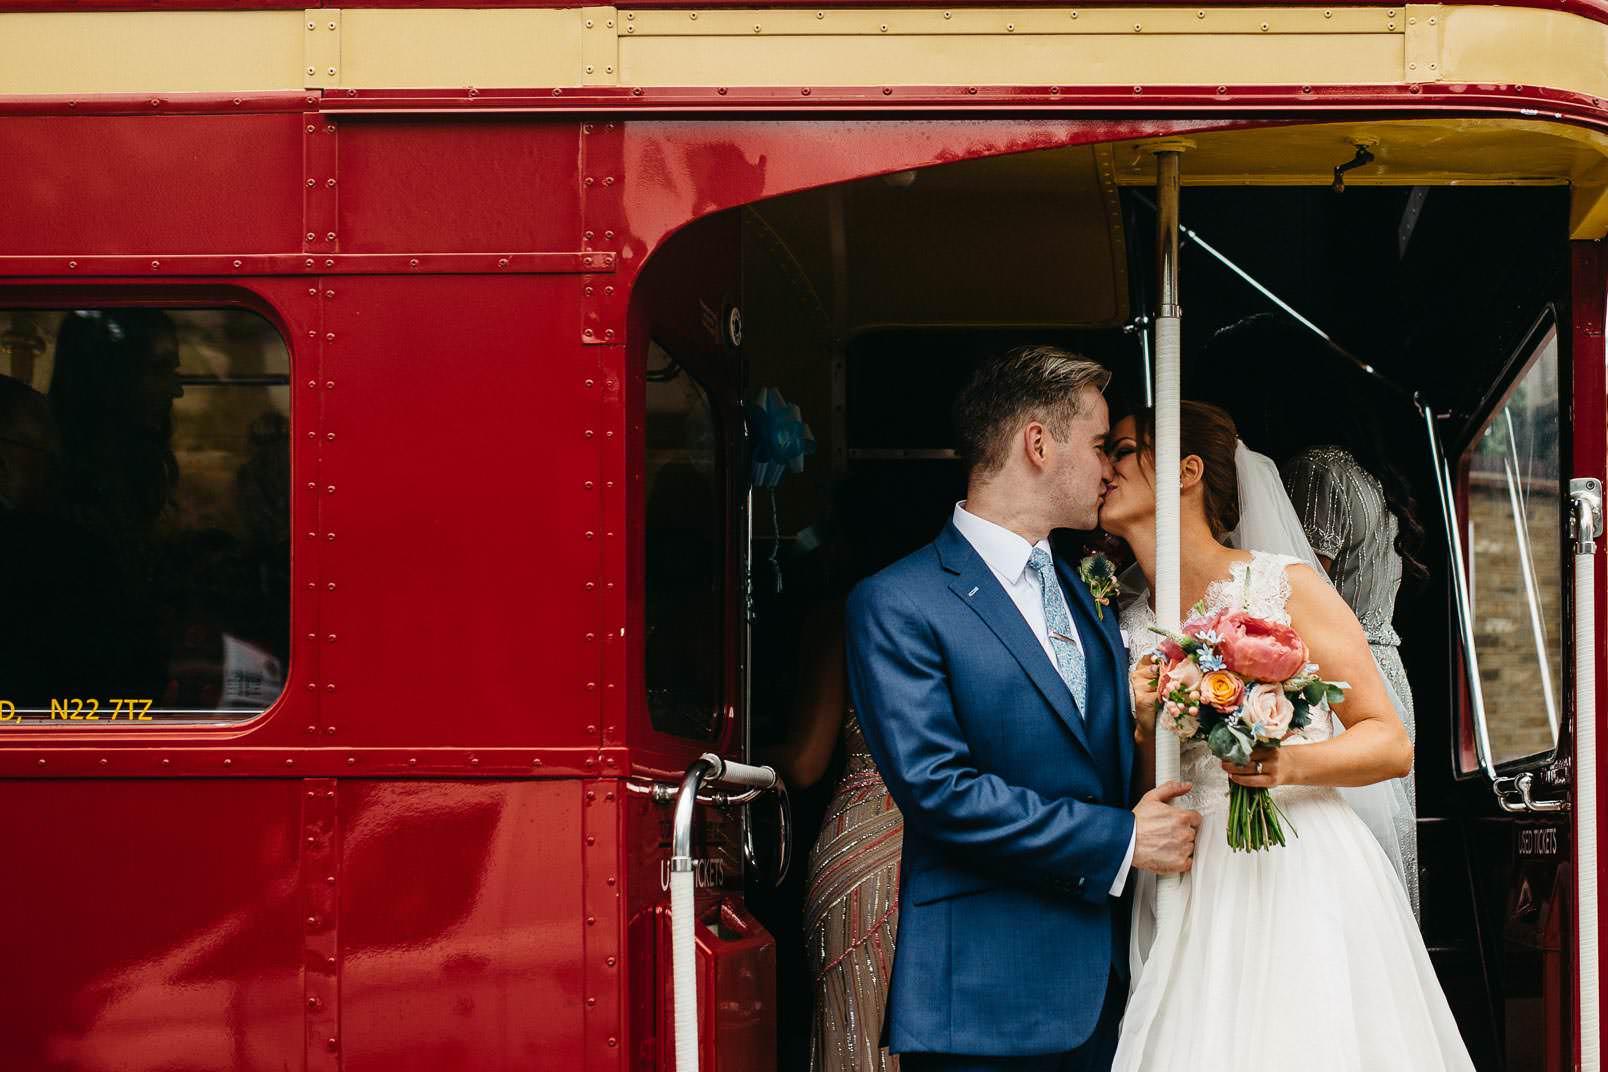 kiss in wedding bus